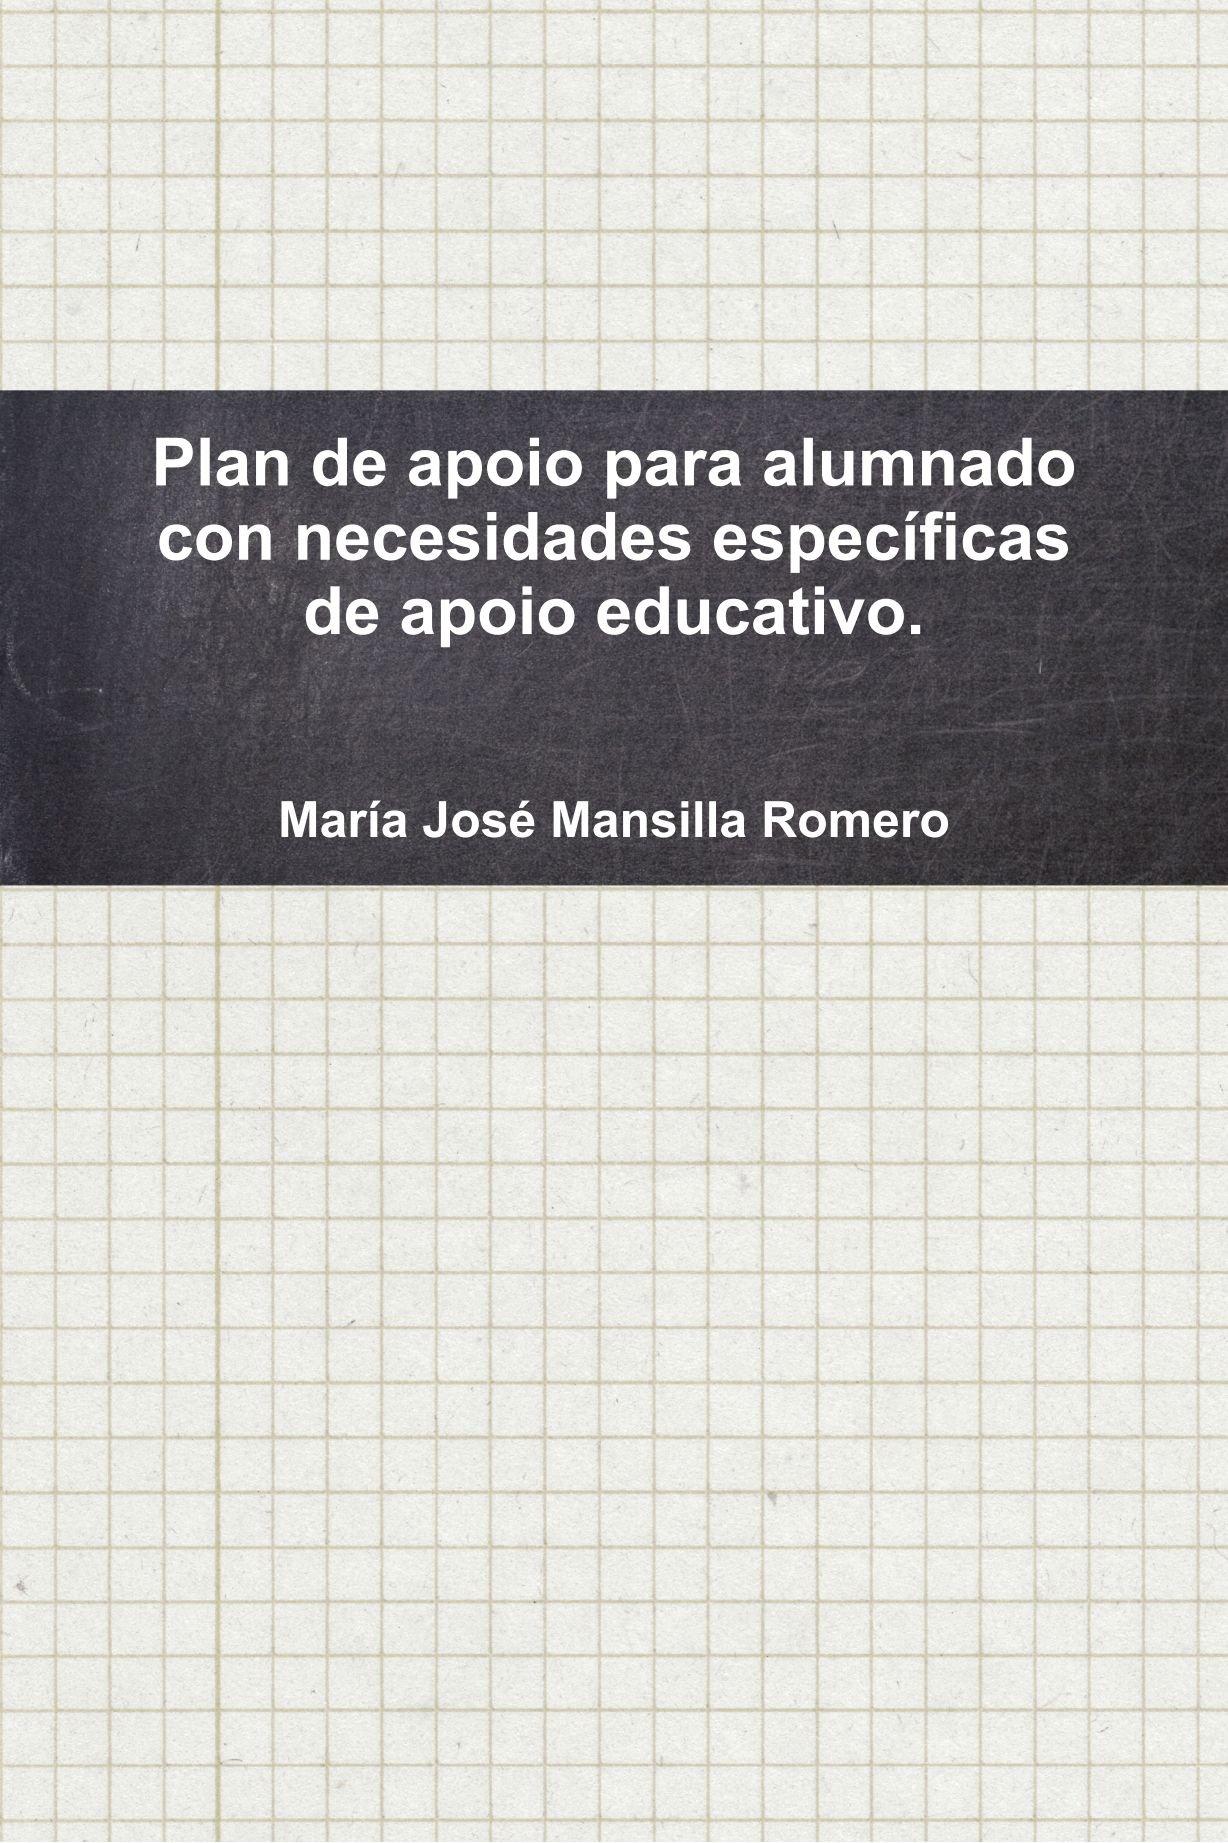 Plan de apoio para alumnado con necesidades especÌficas de apoio educativo. (Galician Edition) ebook